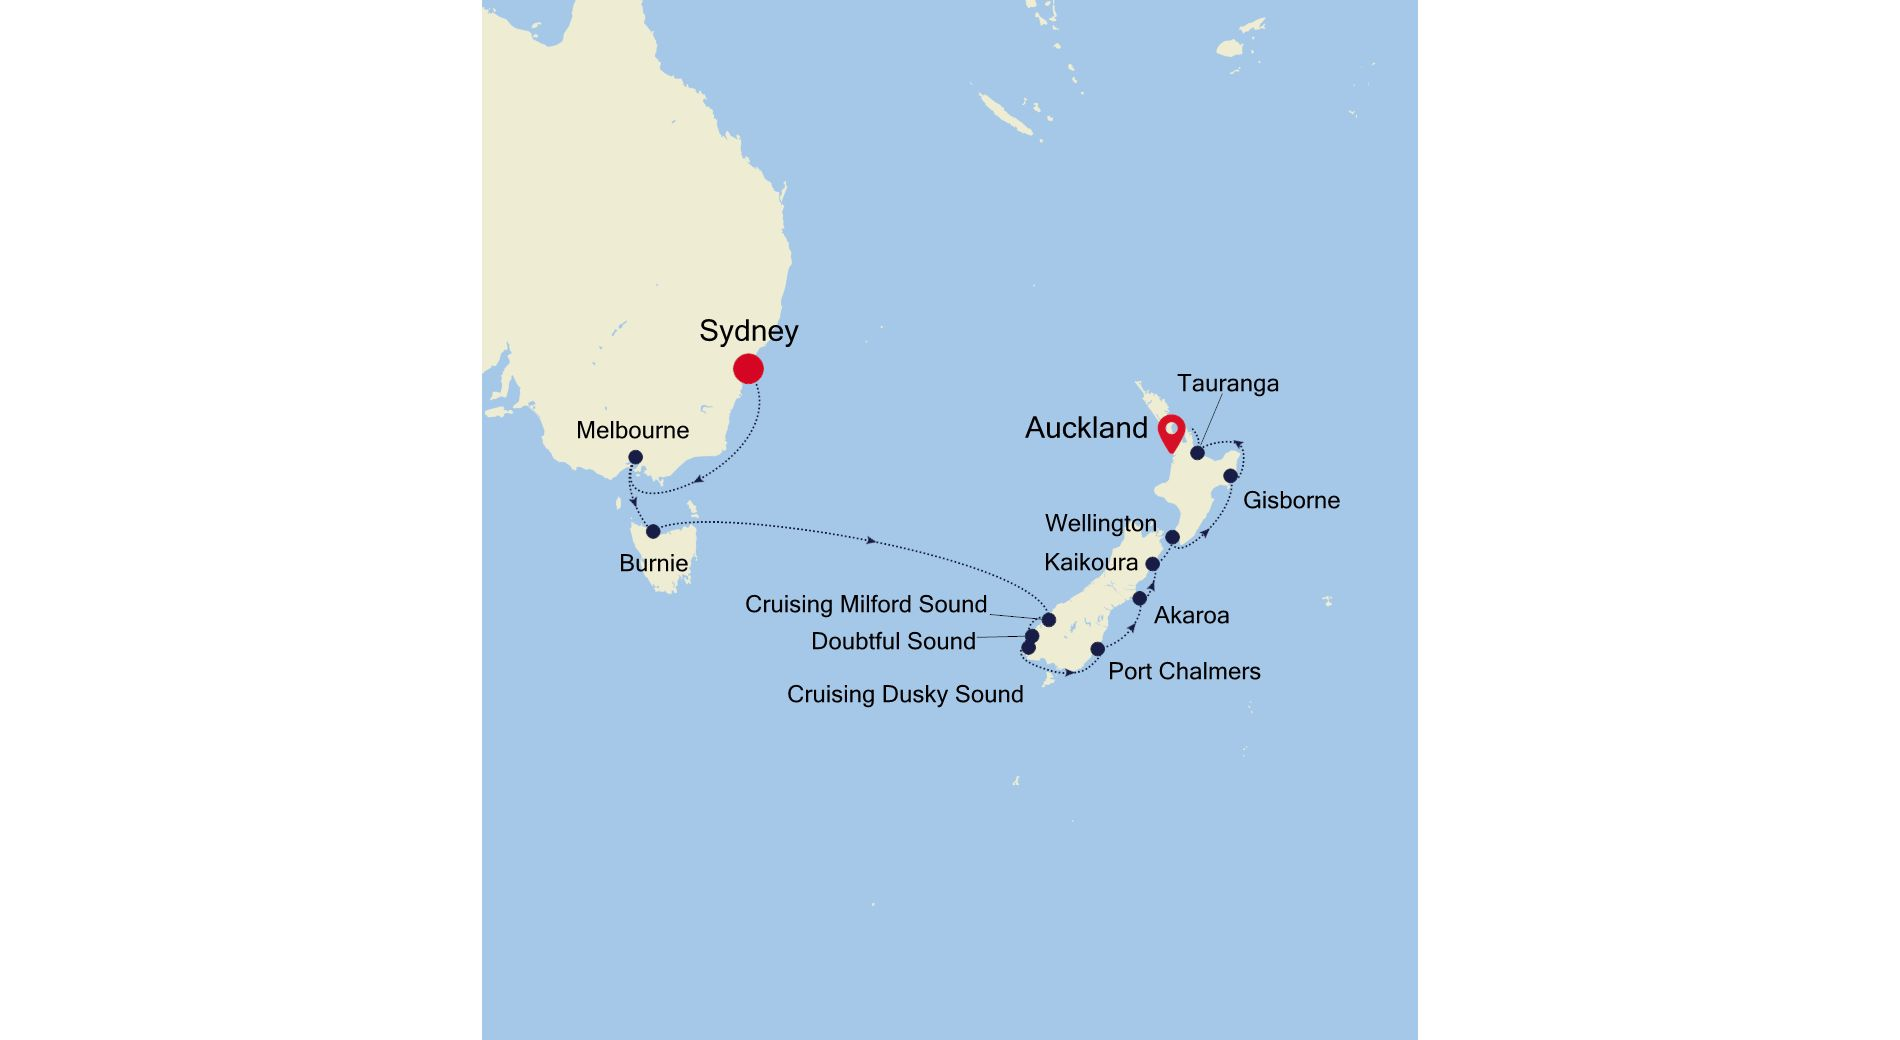 SM201220016 - Sydney to Auckland